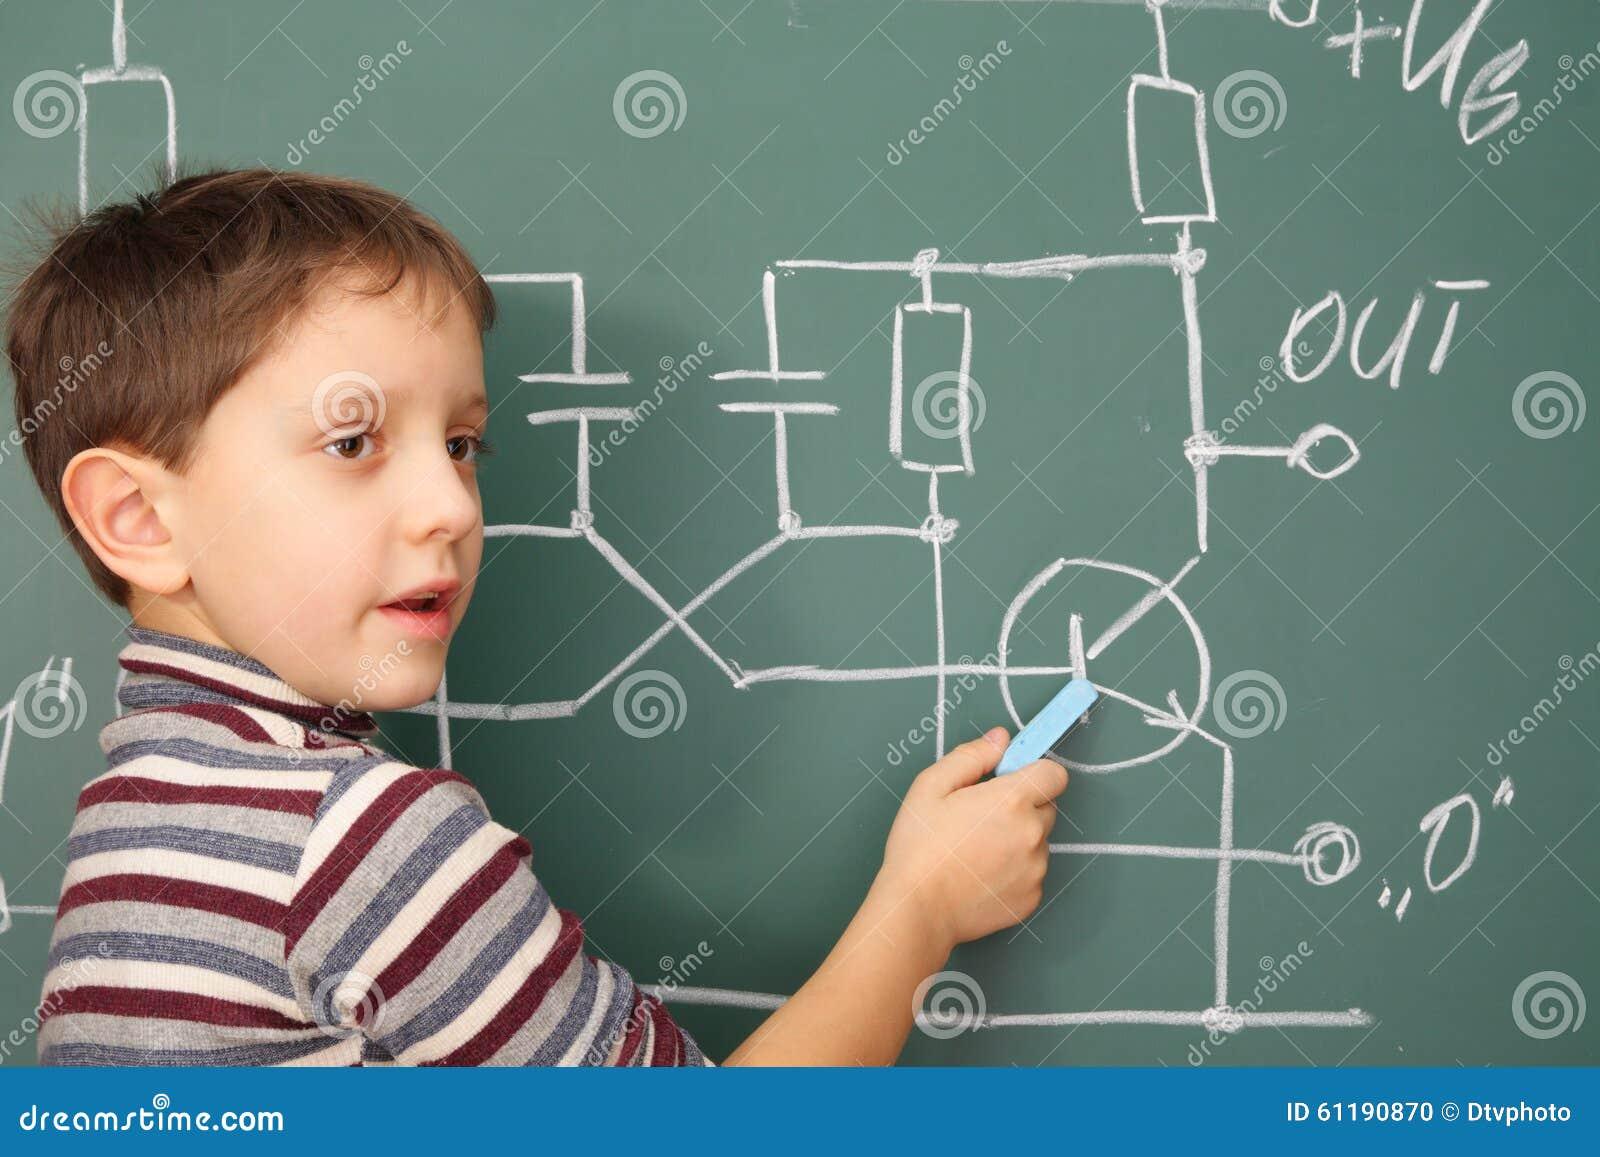 Nauczyciel elektronika